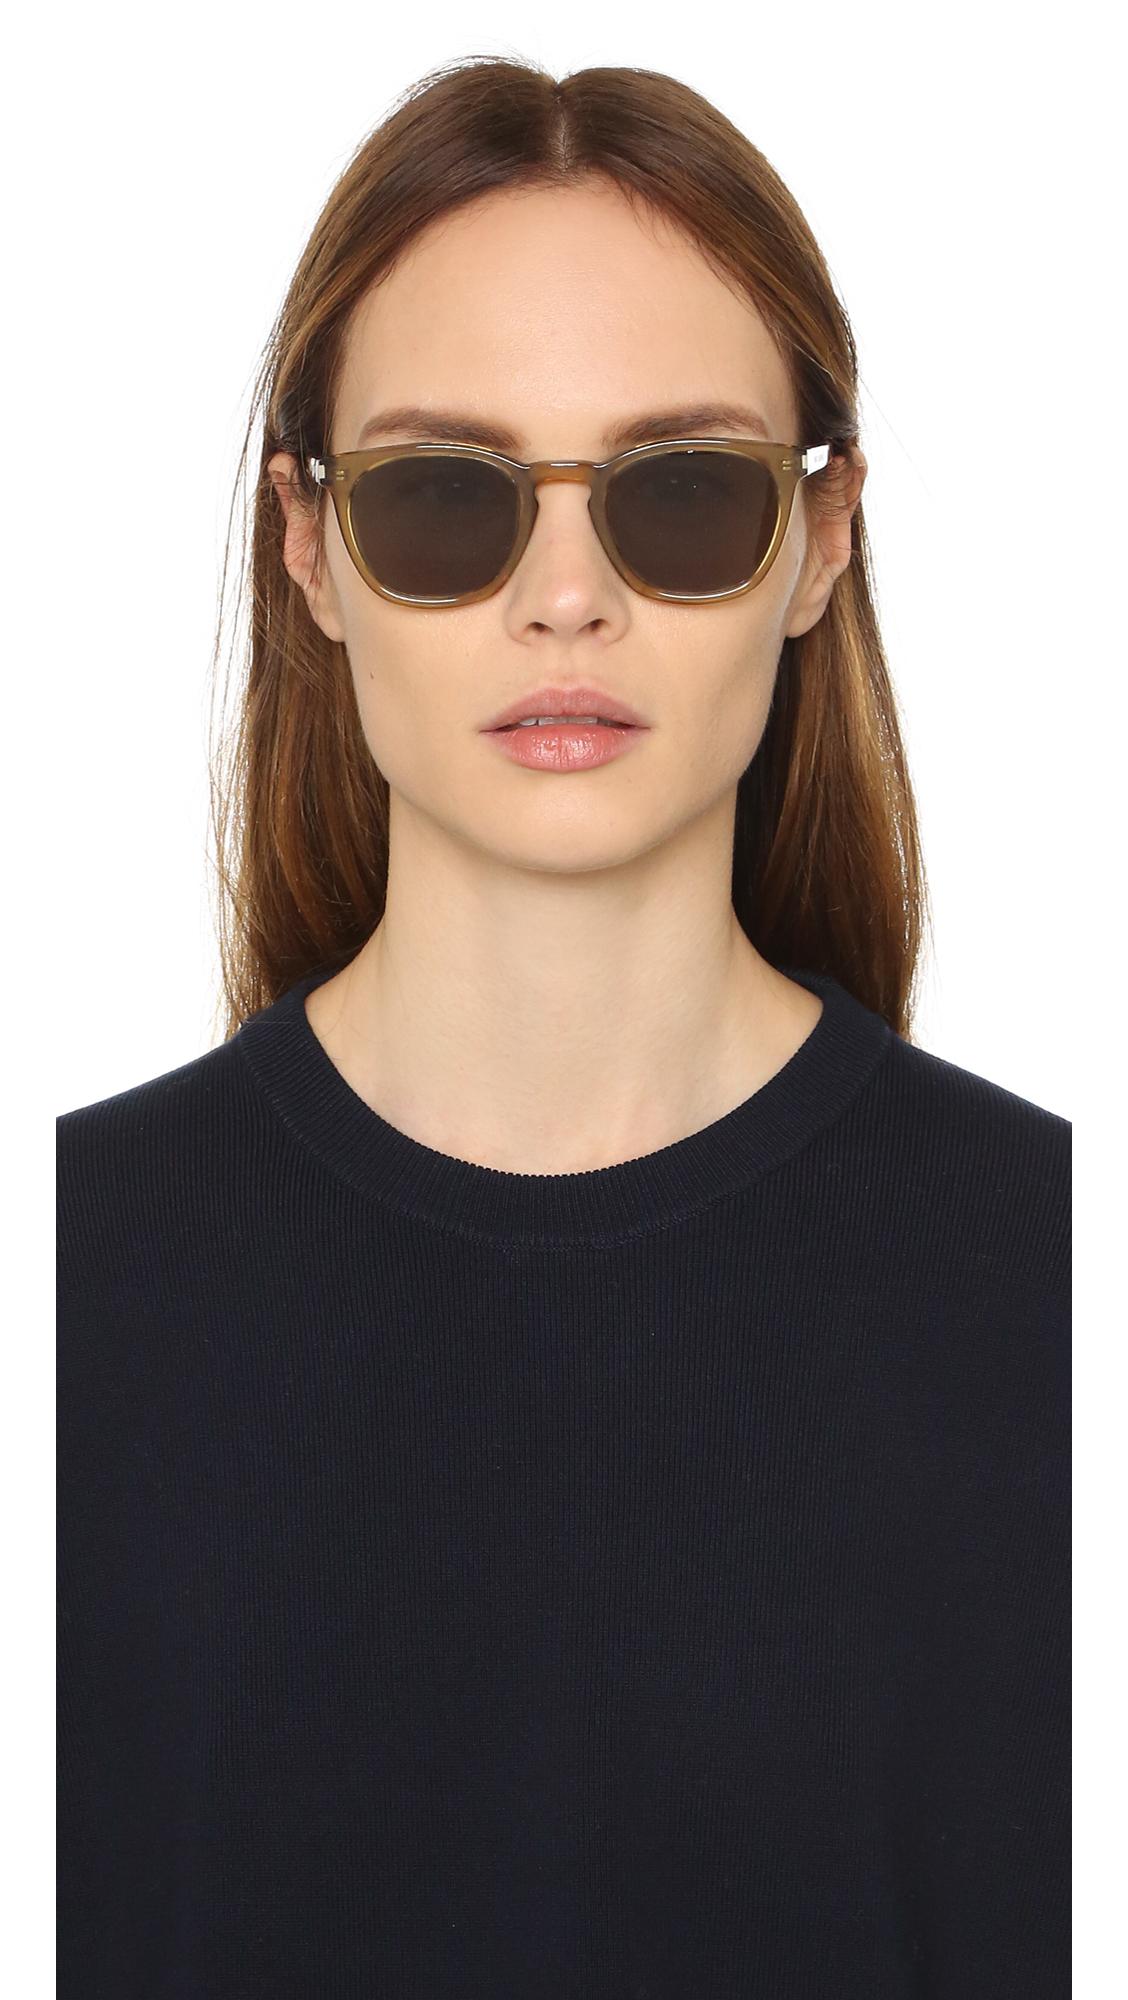 Saint Laurent Sl 28 Sunglasses In Green Lyst